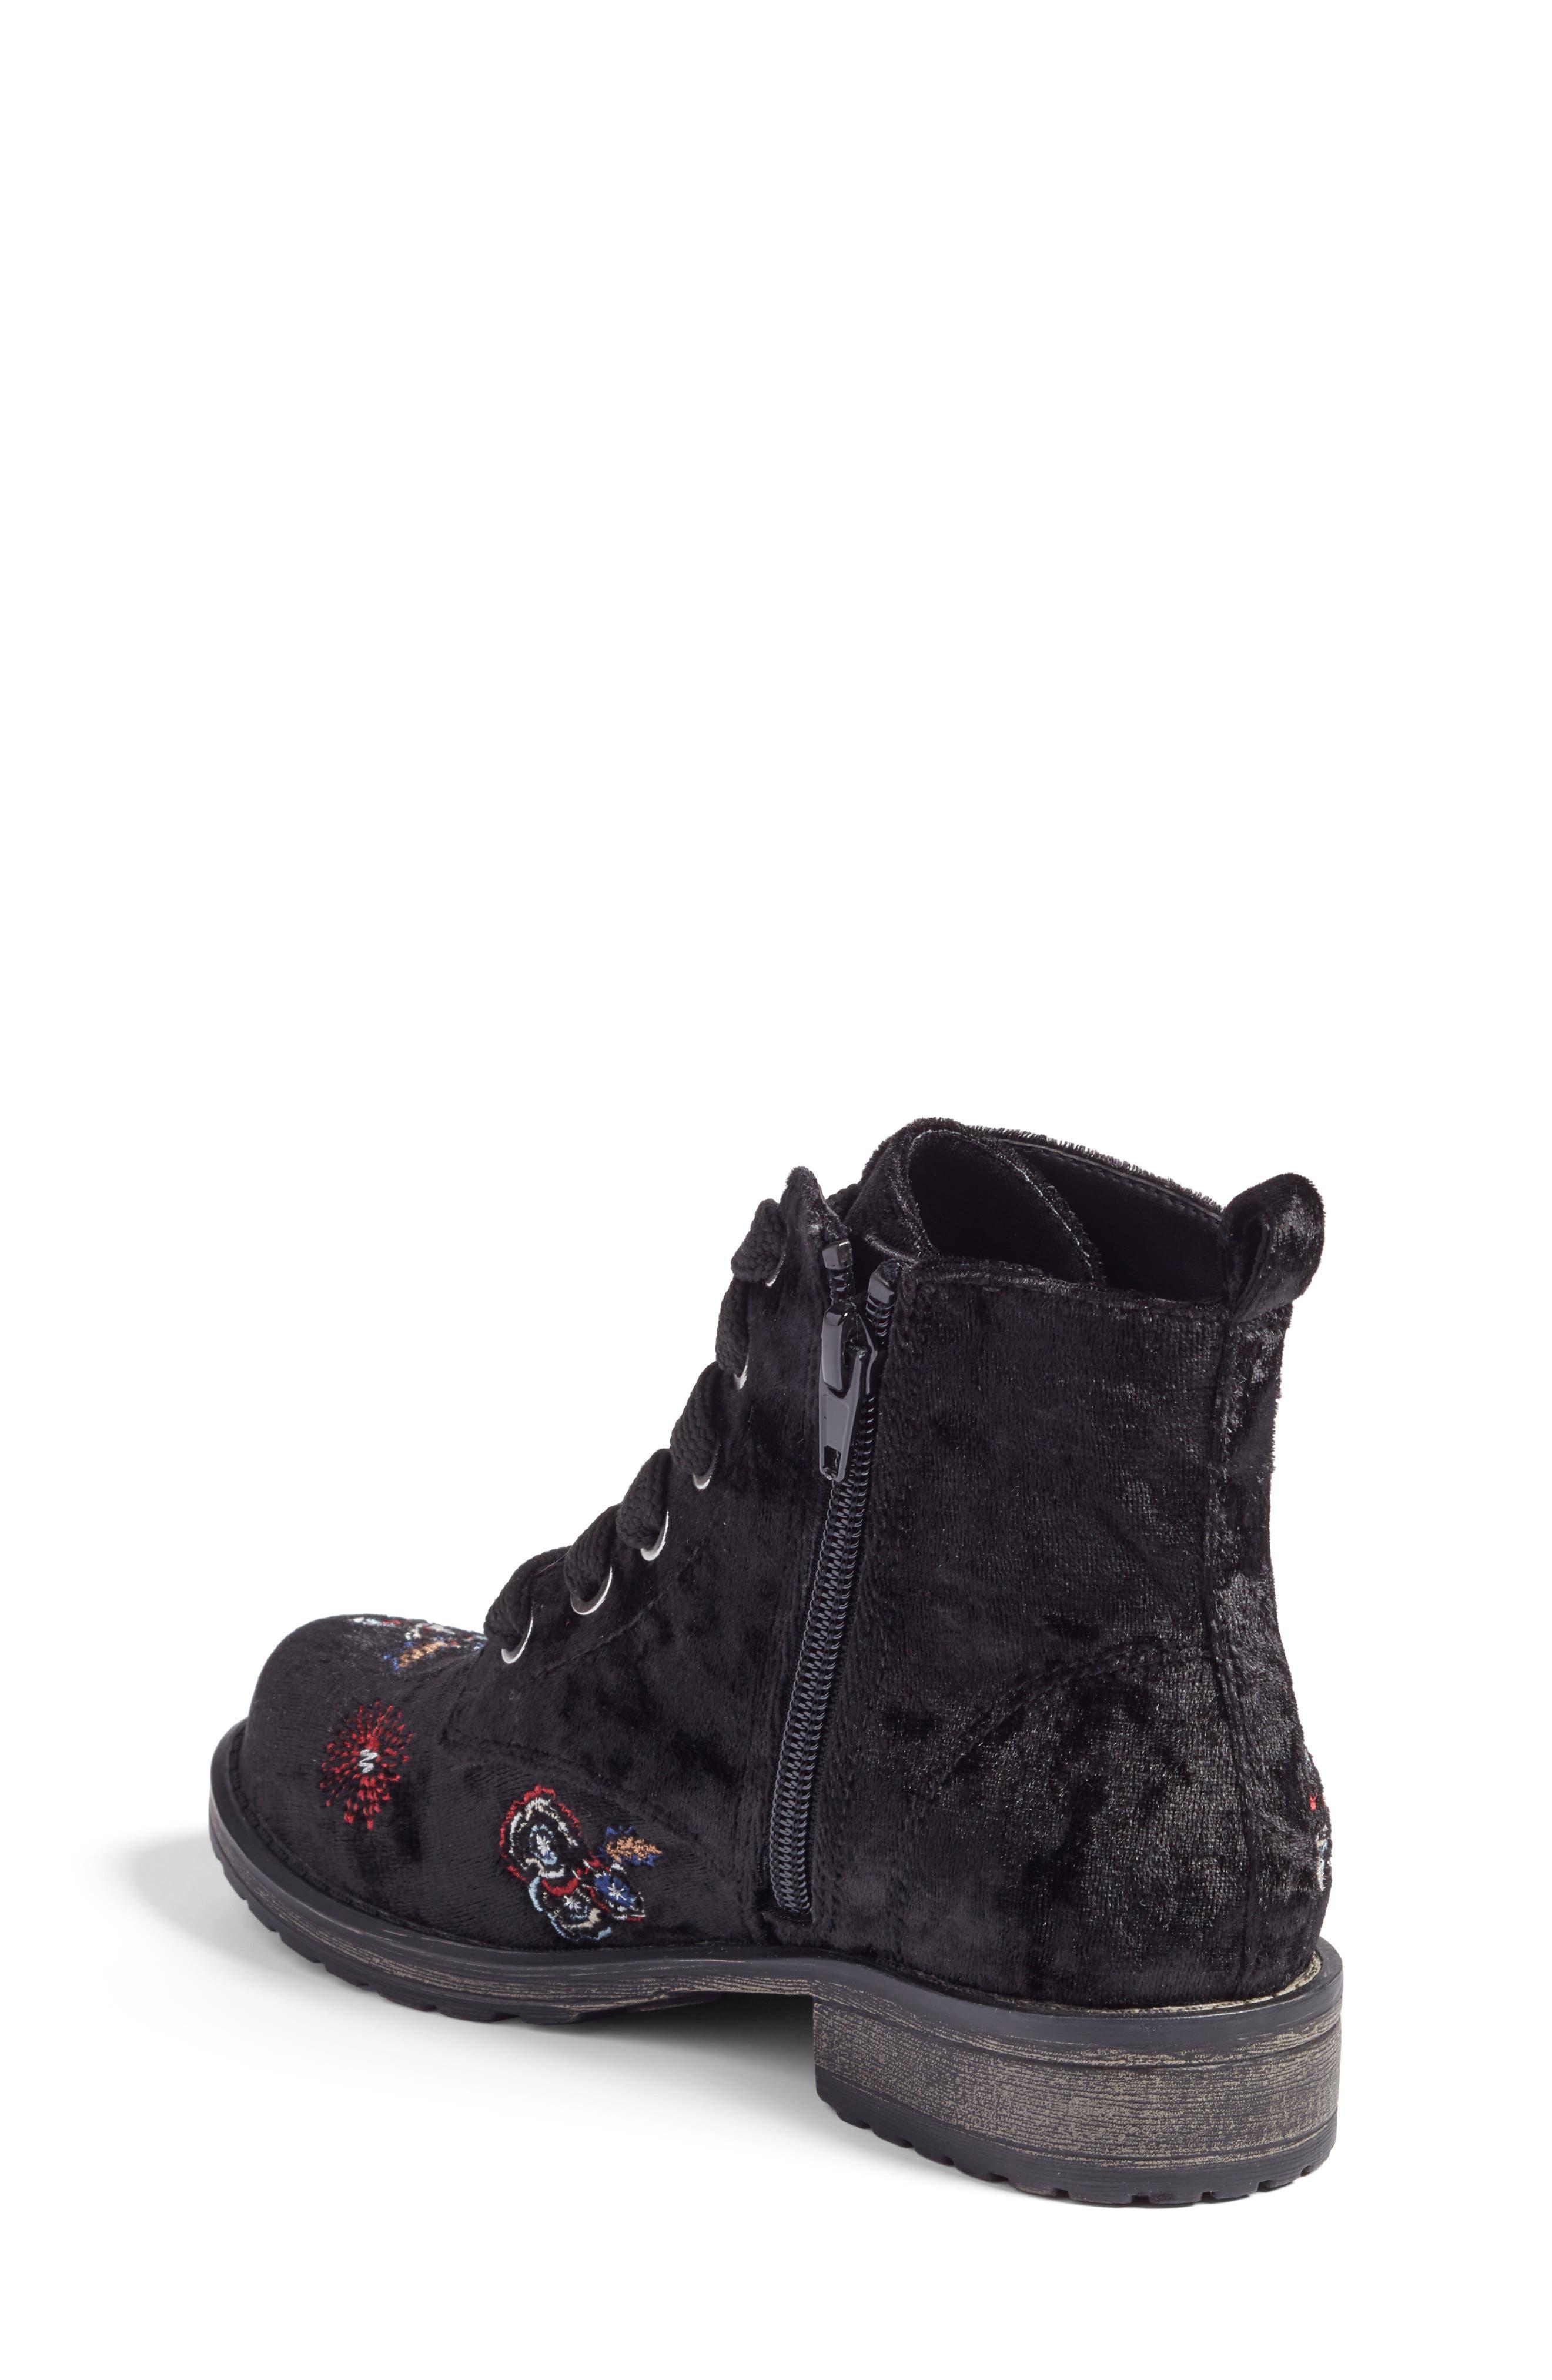 Lilla Combat Boot,                             Alternate thumbnail 2, color,                             Black Multi Velvet